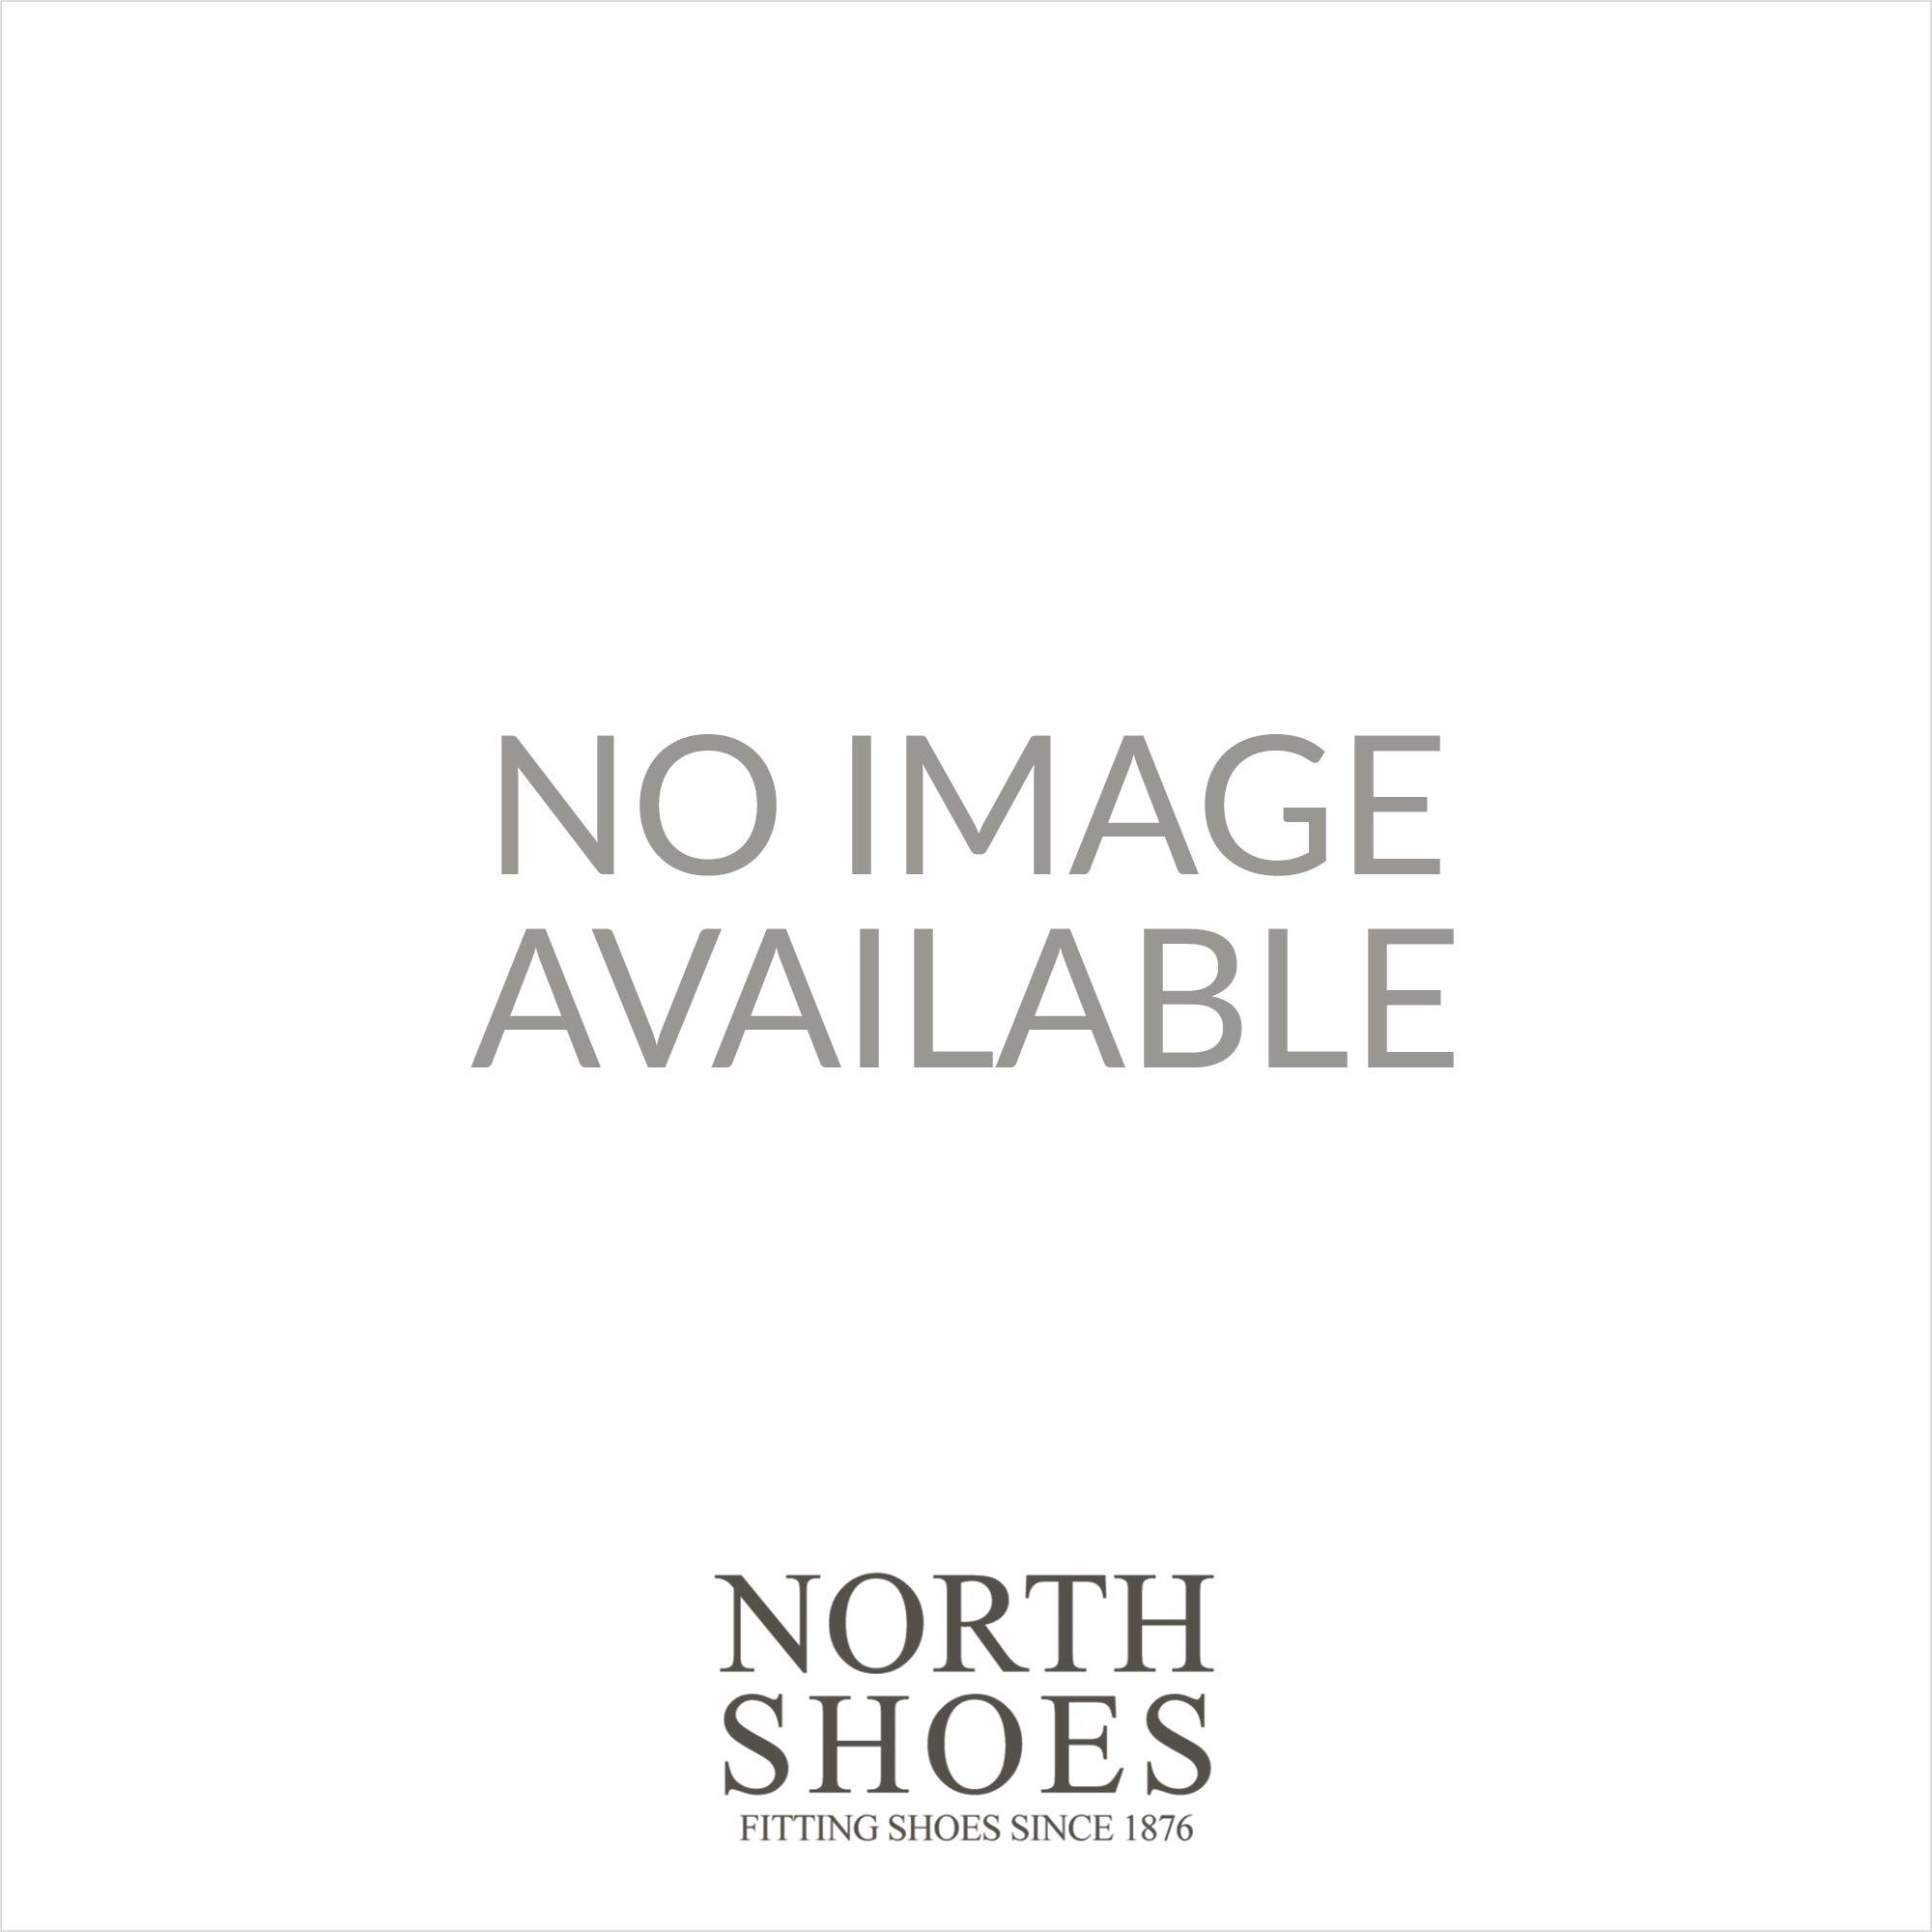 Leather Womens Wedge Black Sling Tamaris 29303 Back Sandals 1JTlcFK3